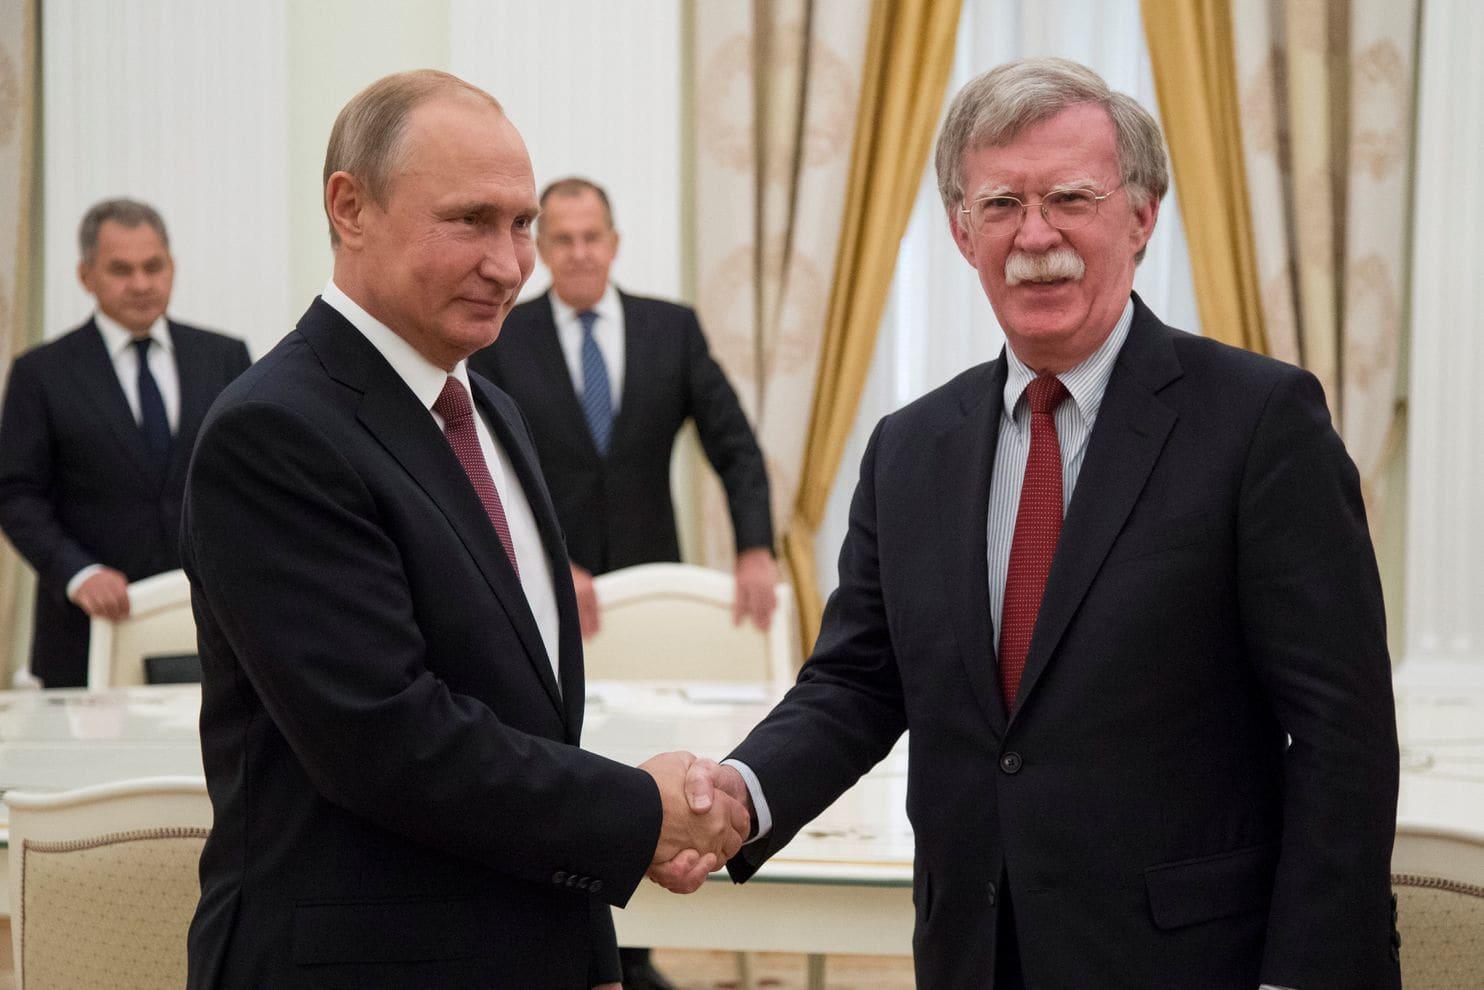 John Bolton paving the way for Trump/Putin meeting